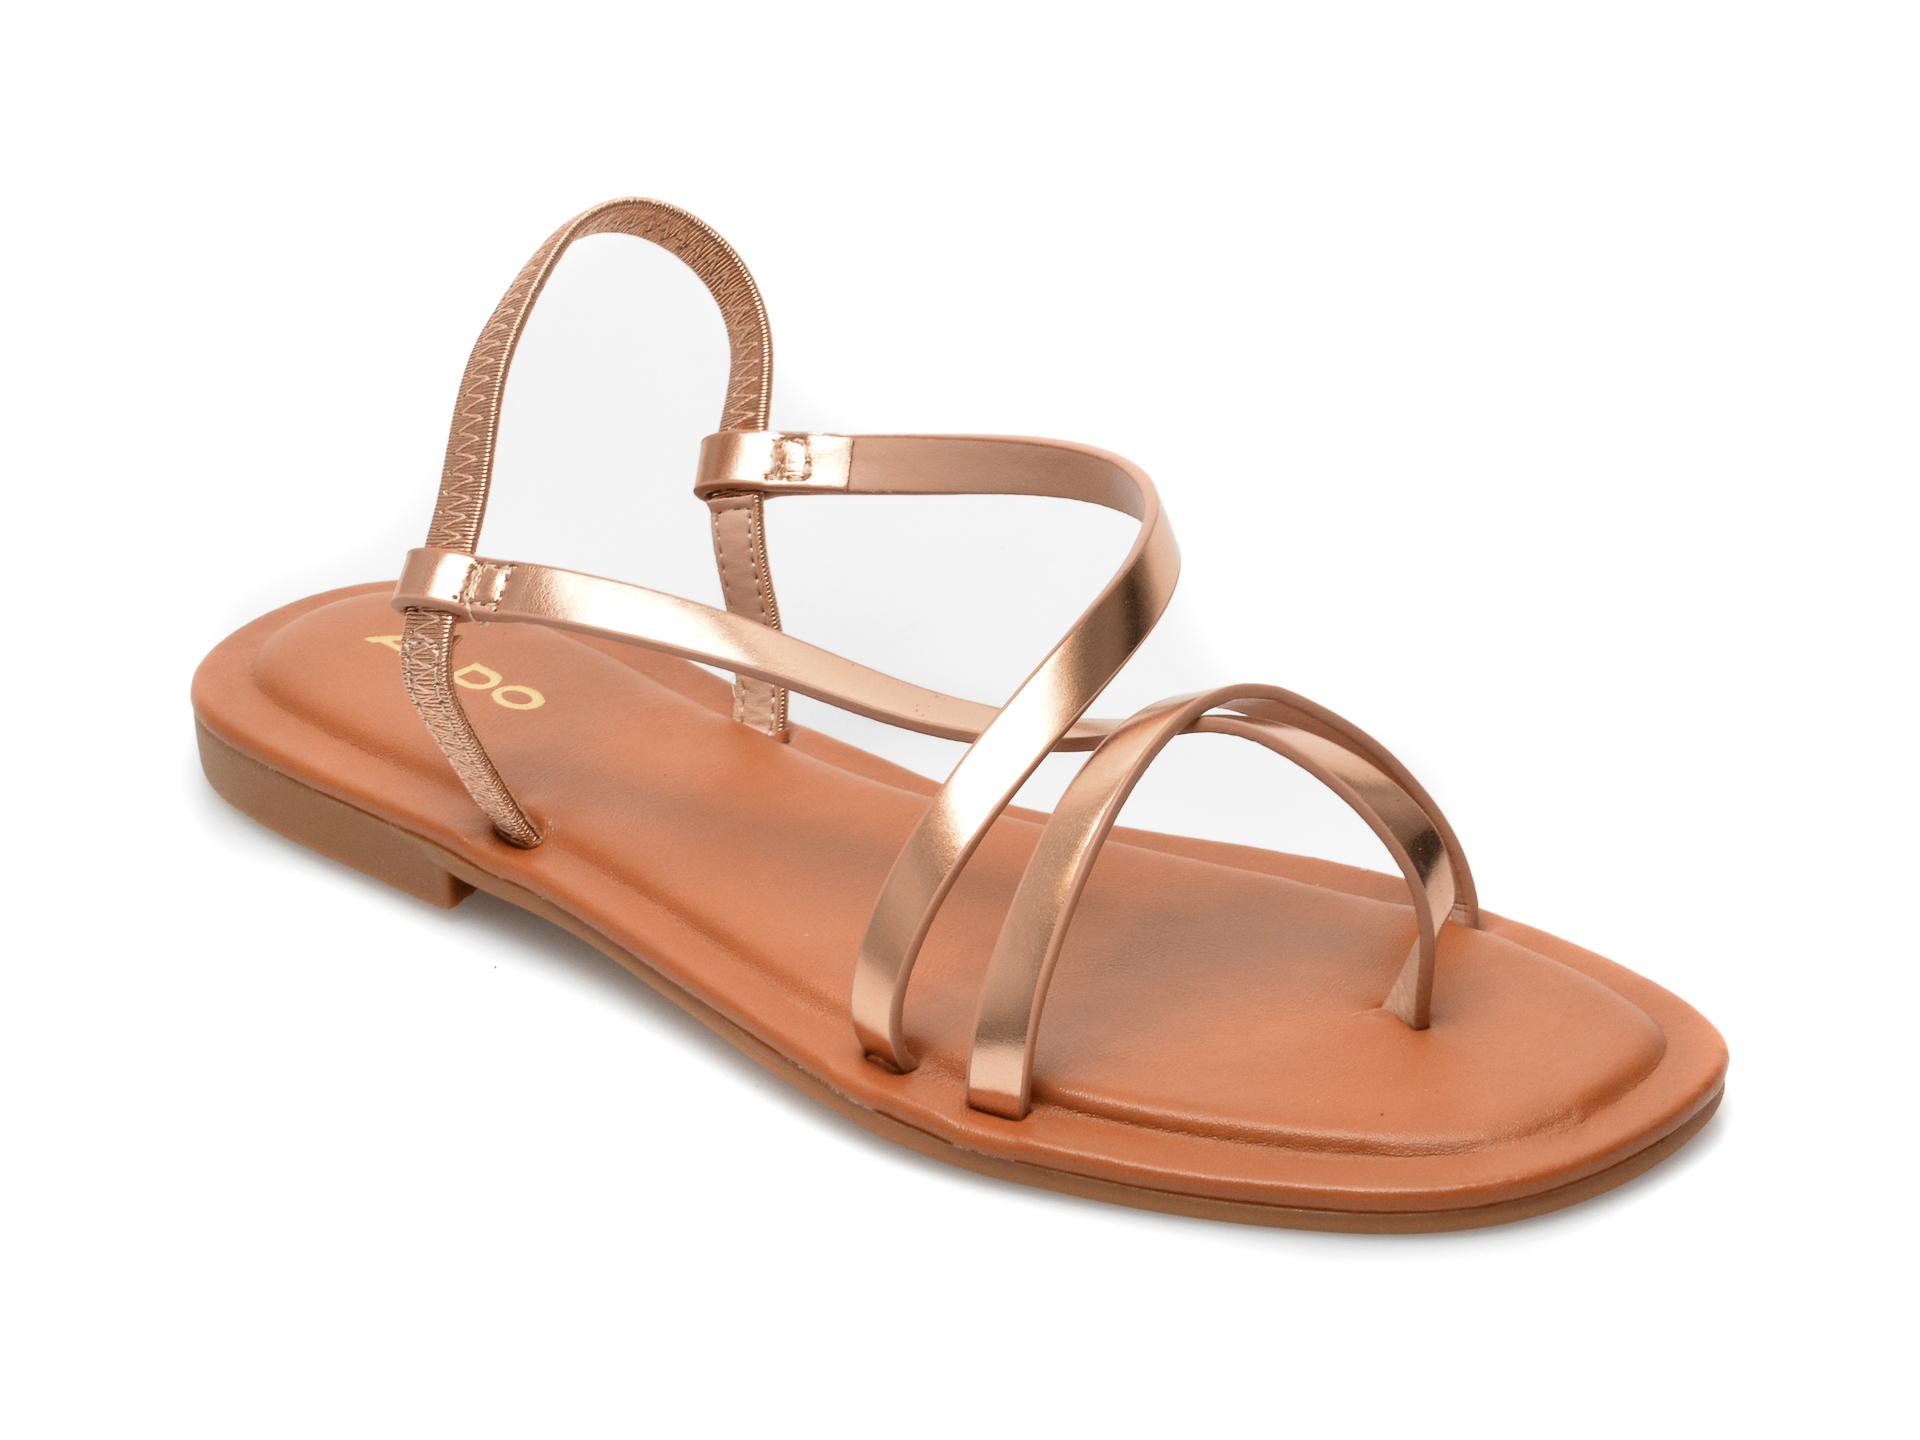 Sandale ALDO roz, 13189140, din piele ecologica imagine otter.ro 2021